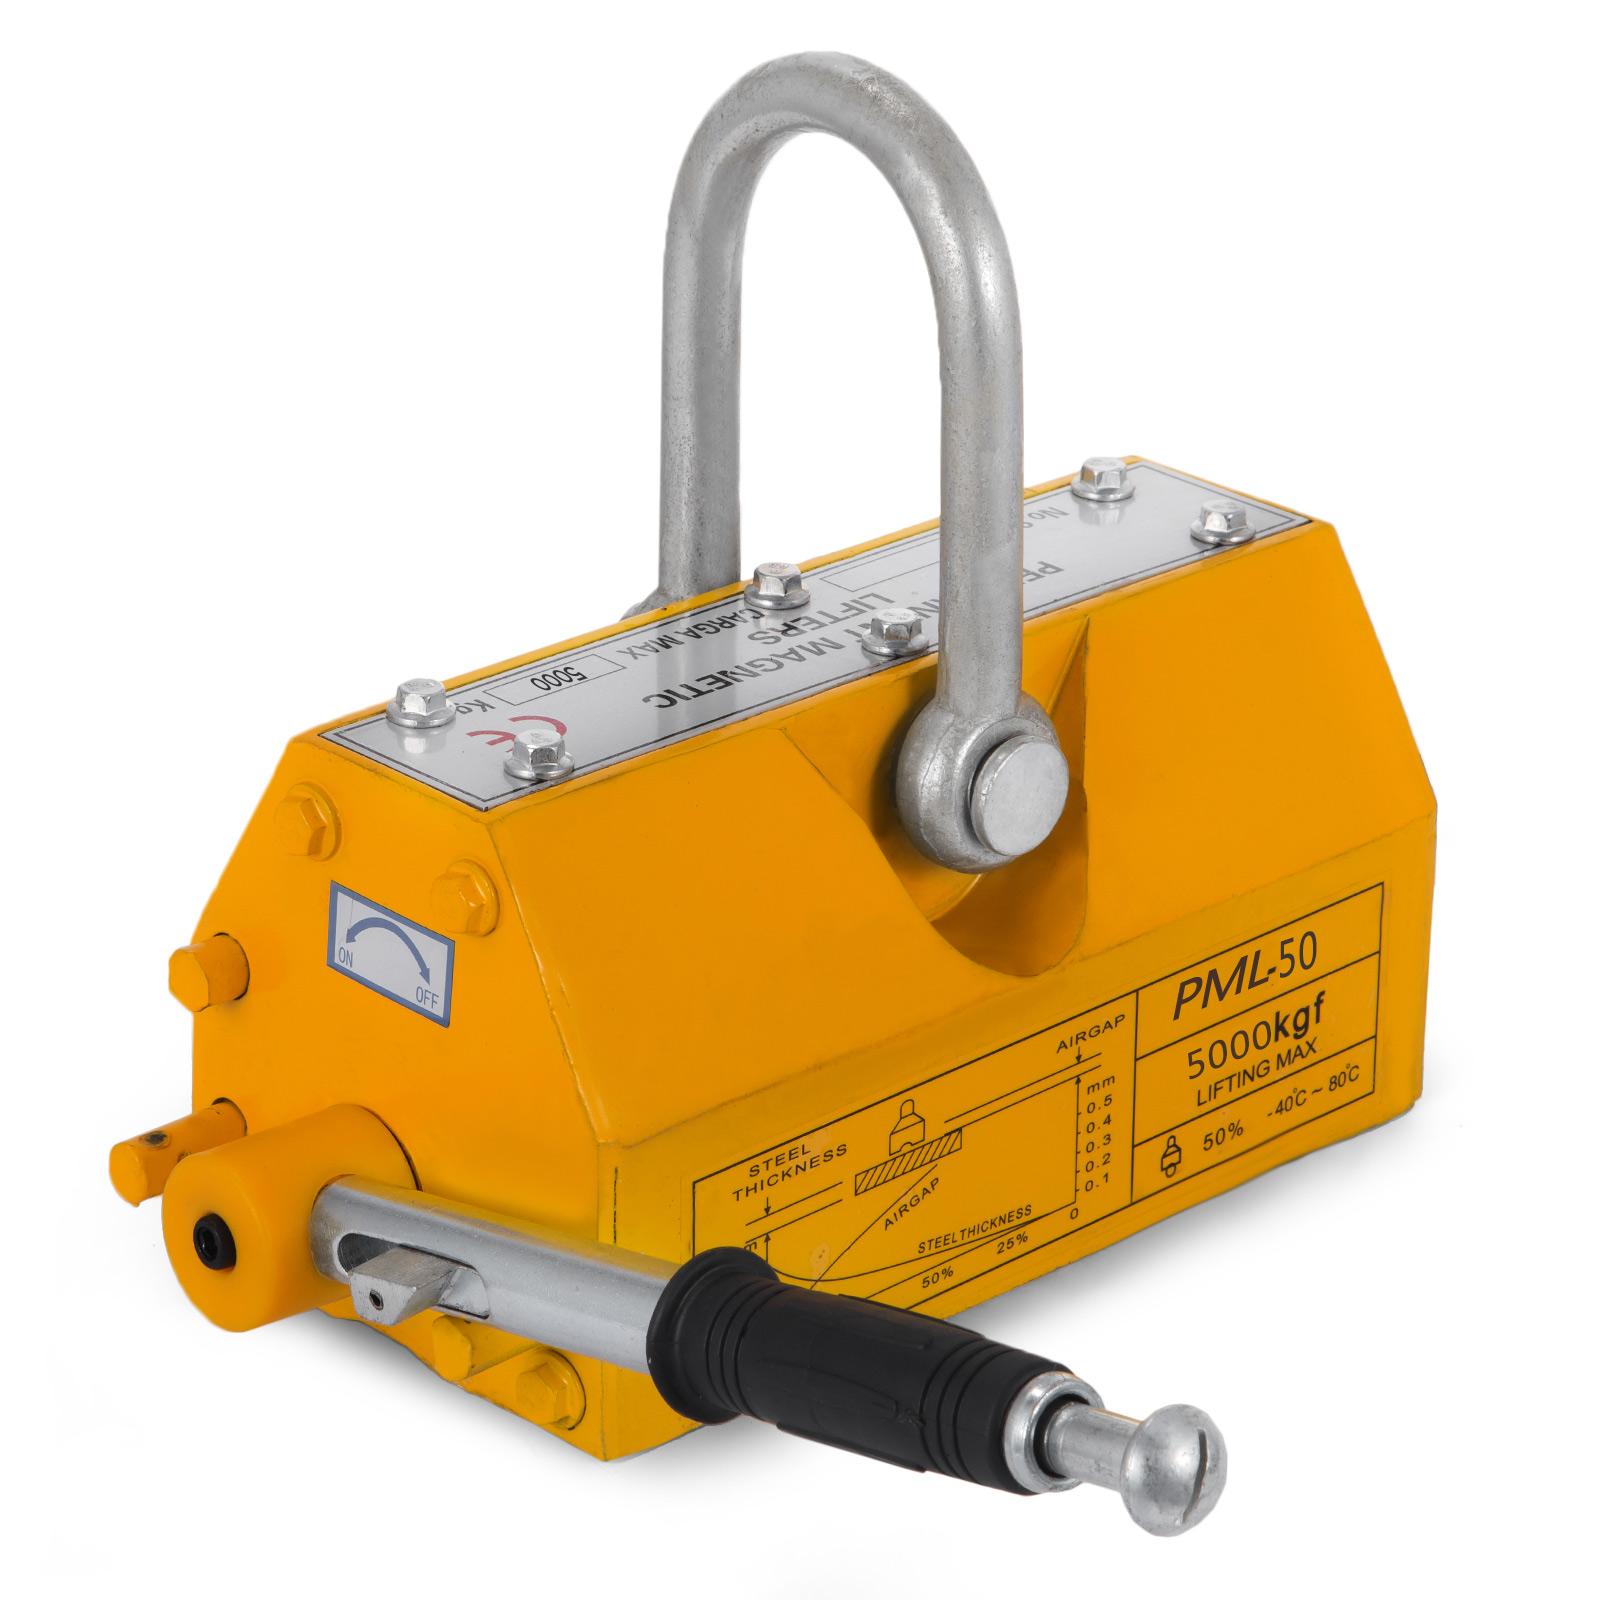 100-300-600-1000KG-Steel-Magnetic-Lifter-Heavy-Duty-Crane-Hoist-Lifting-Magnet miniature 112